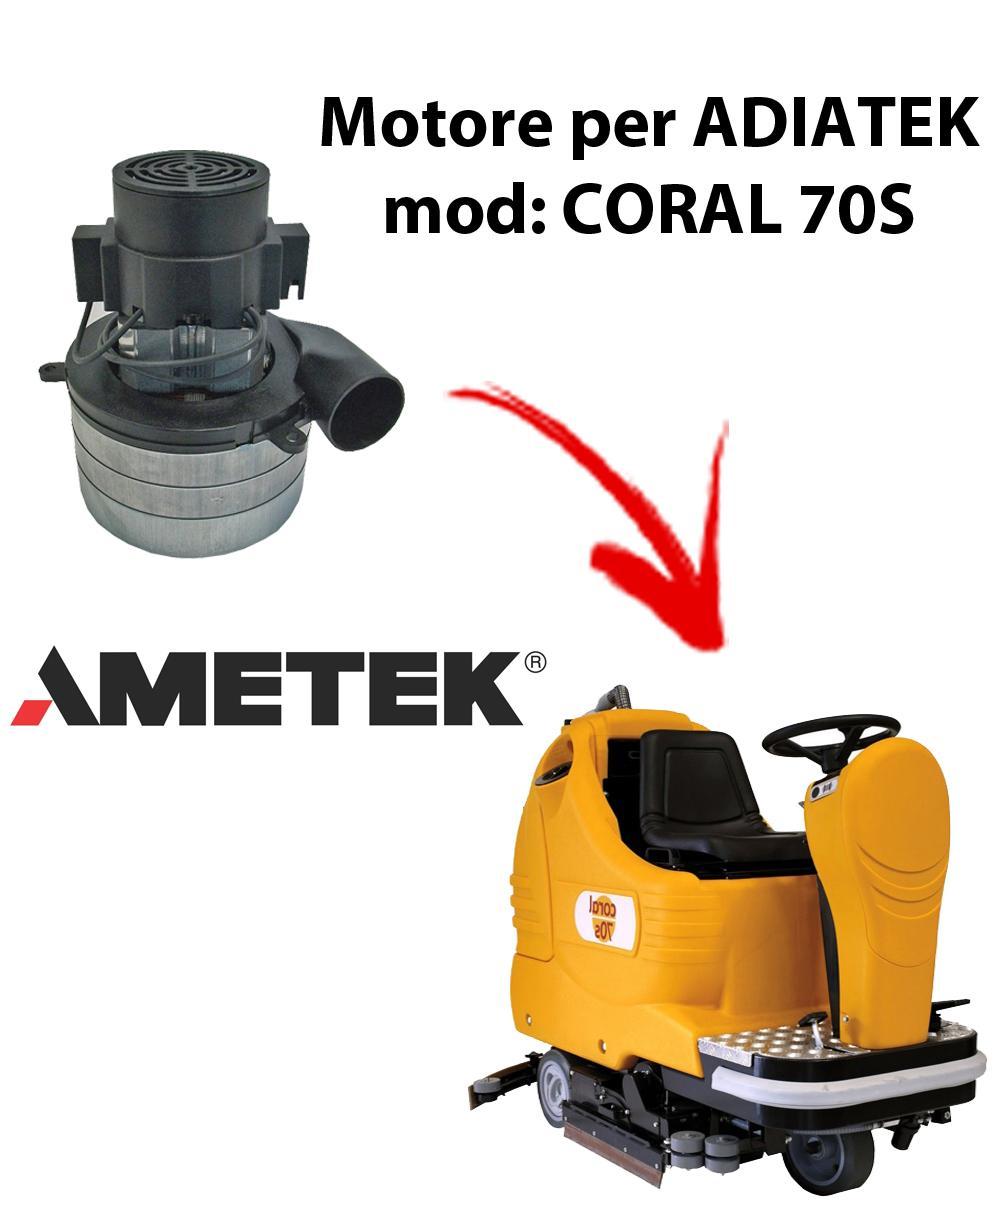 Coral 70S Motore aspirazione AMETEK ITALIA per lavapavimenti Adiatek